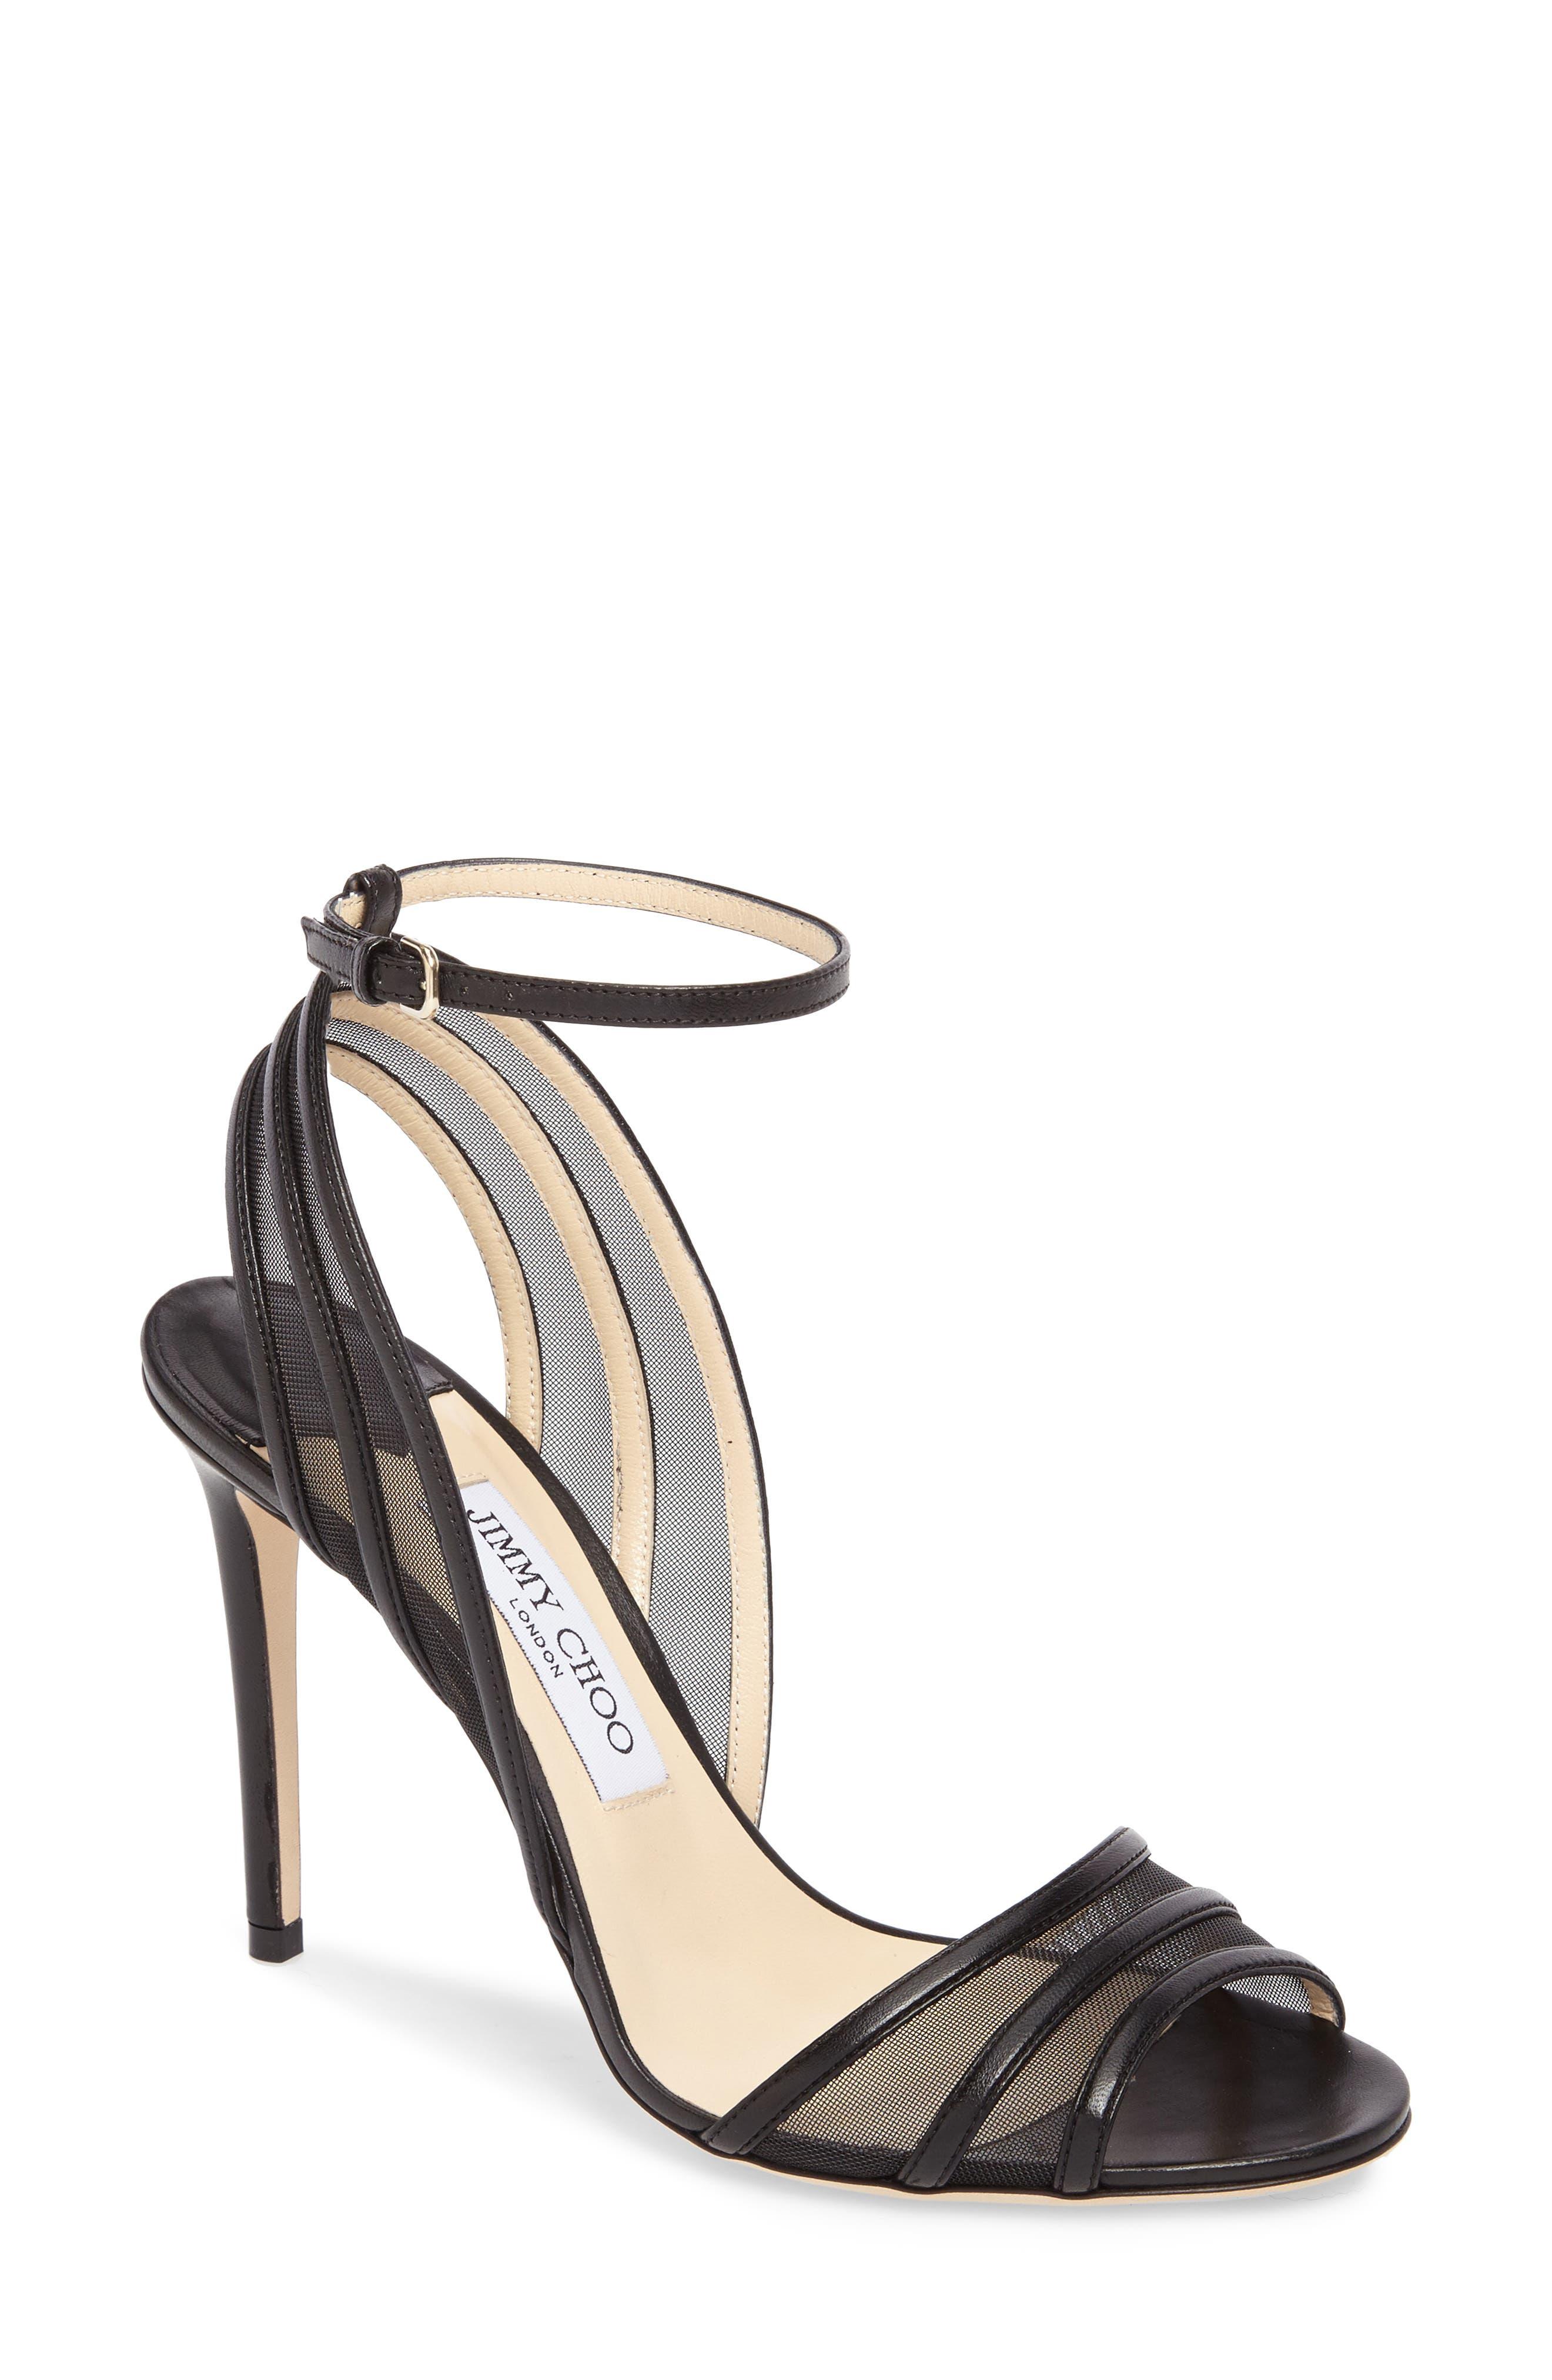 Betty Illusion Sandal,                         Main,                         color, Black/ Black